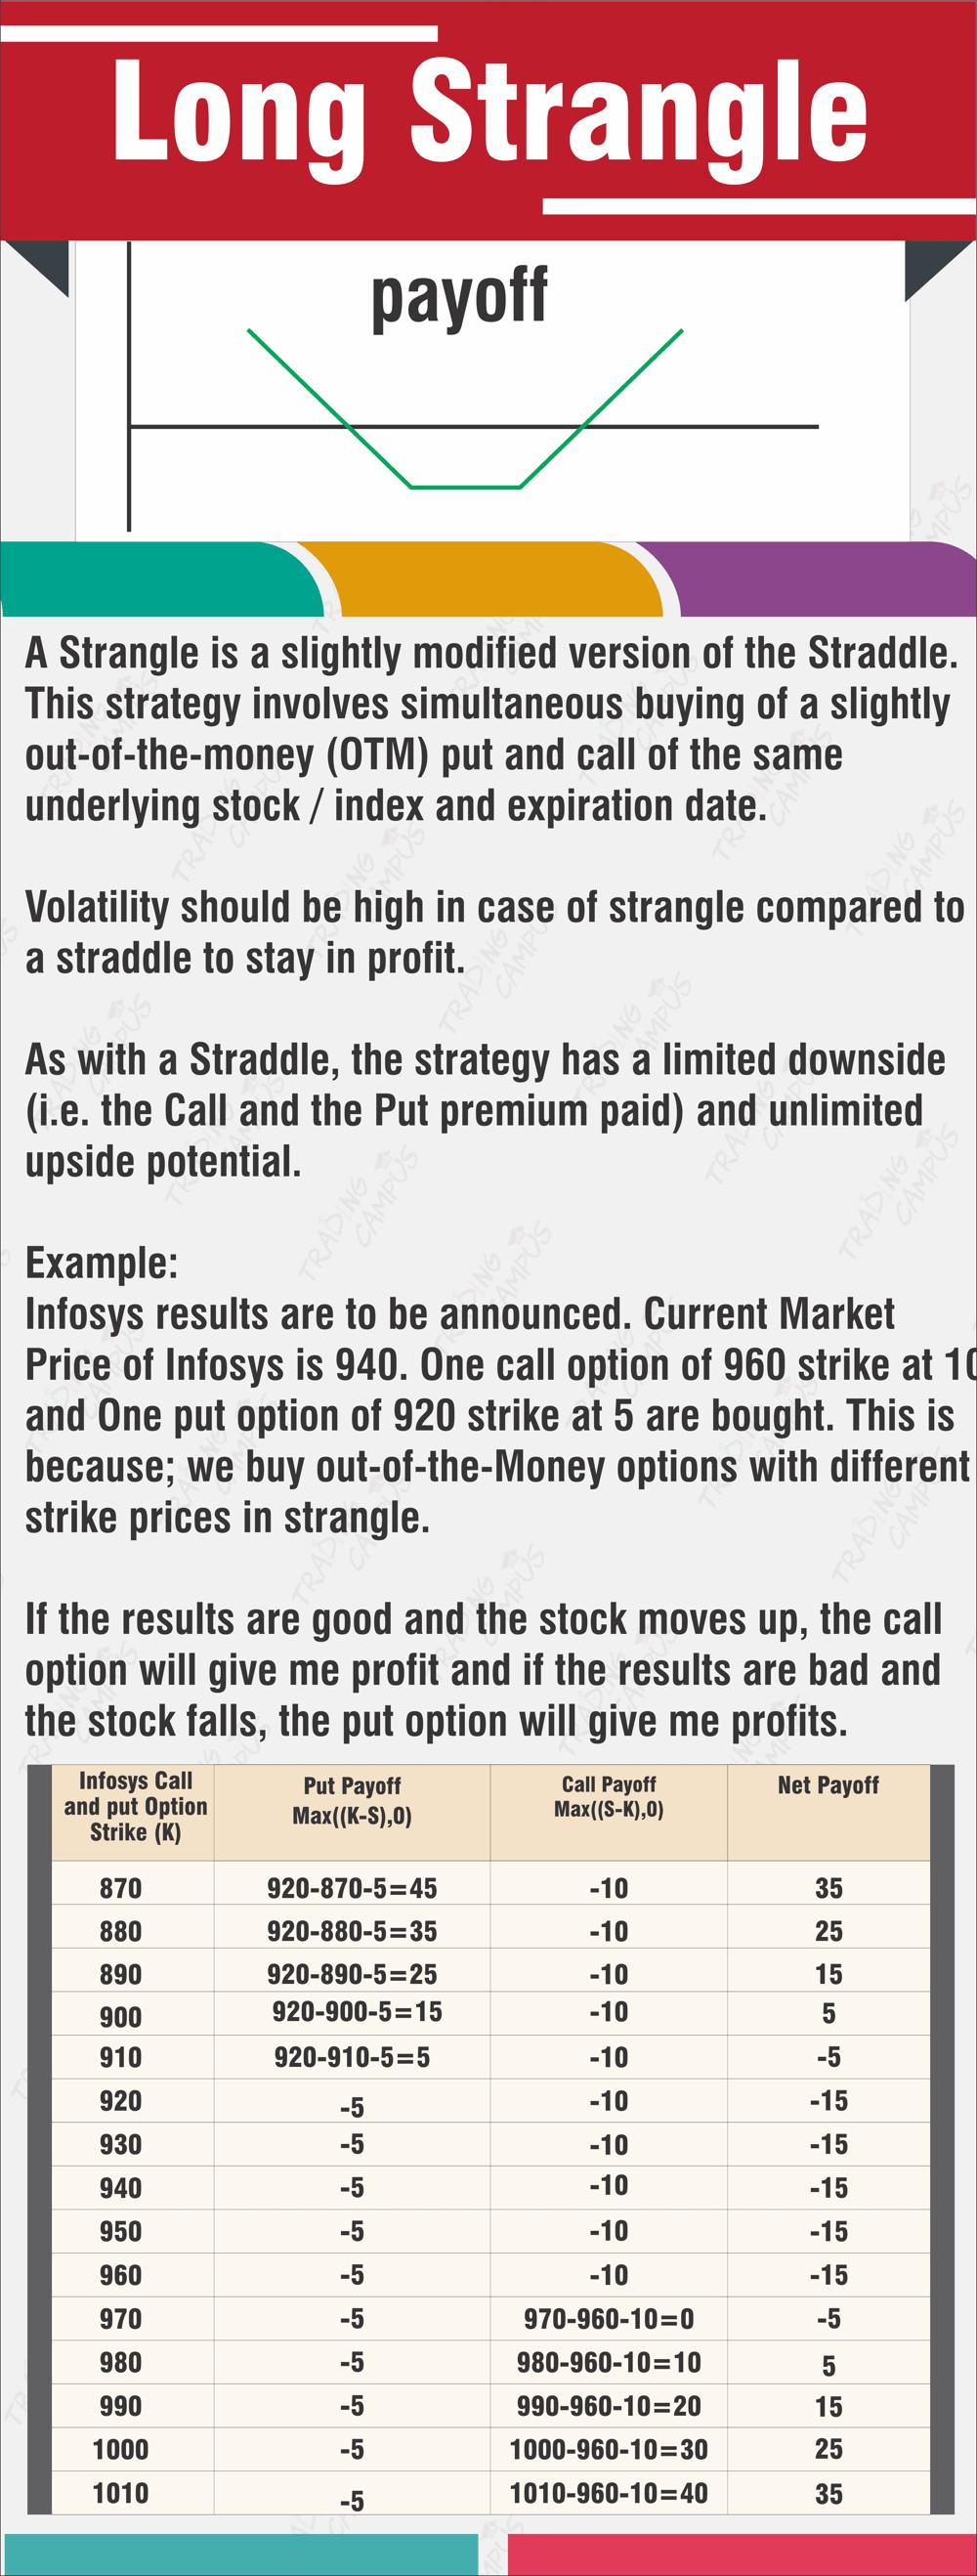 Long Strangle trading strategy